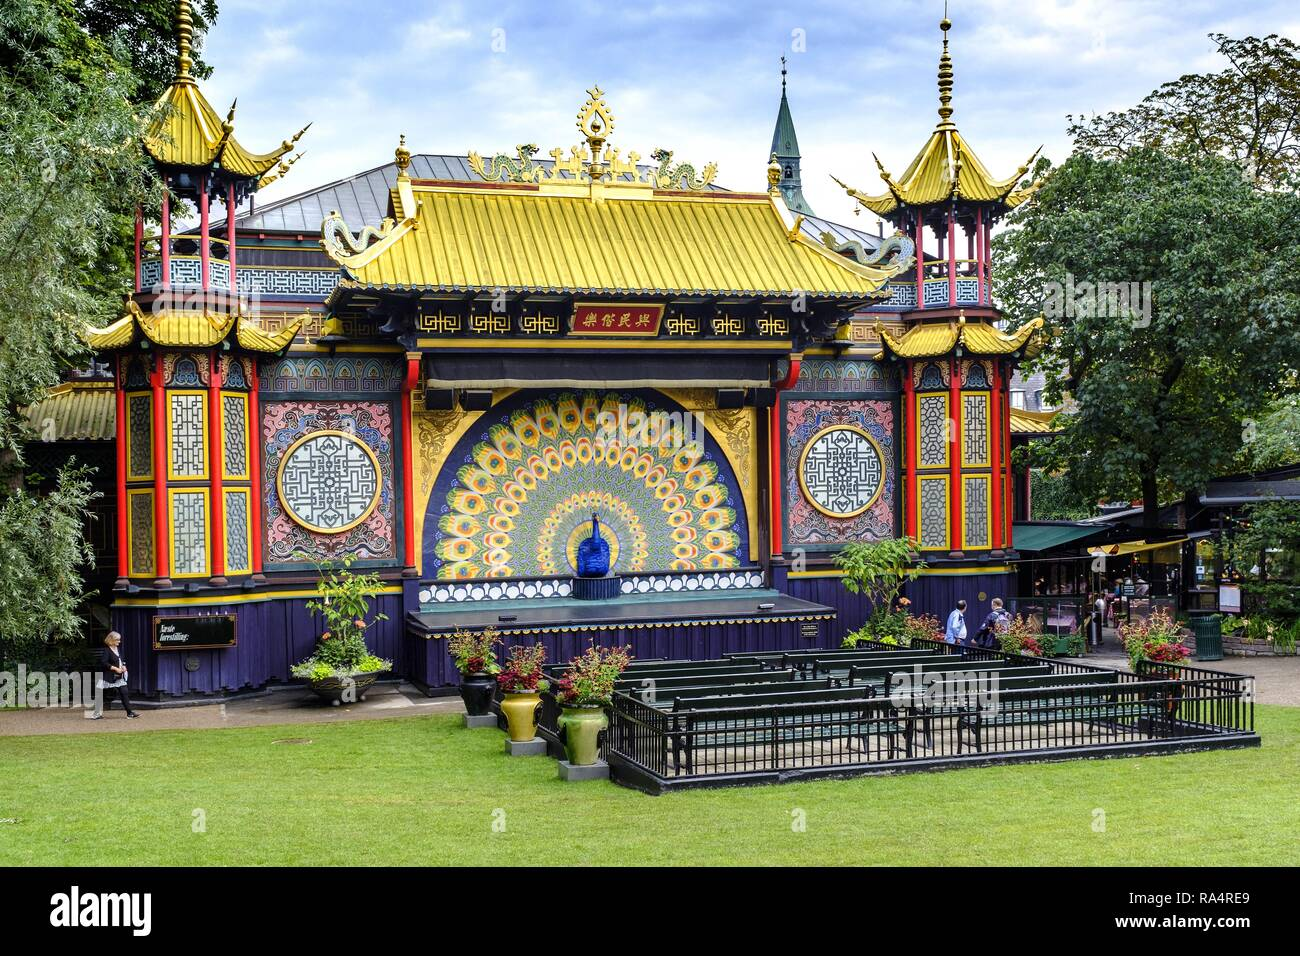 Dania - region Zealand - Kopenhaga - Park rozrywki Tivoli w centrum miasta - atrakcje i ogrody Denmark - Zealand region - Copenhagen city center - historical Tivoli Gardens amusement park - garden att - Stock Image